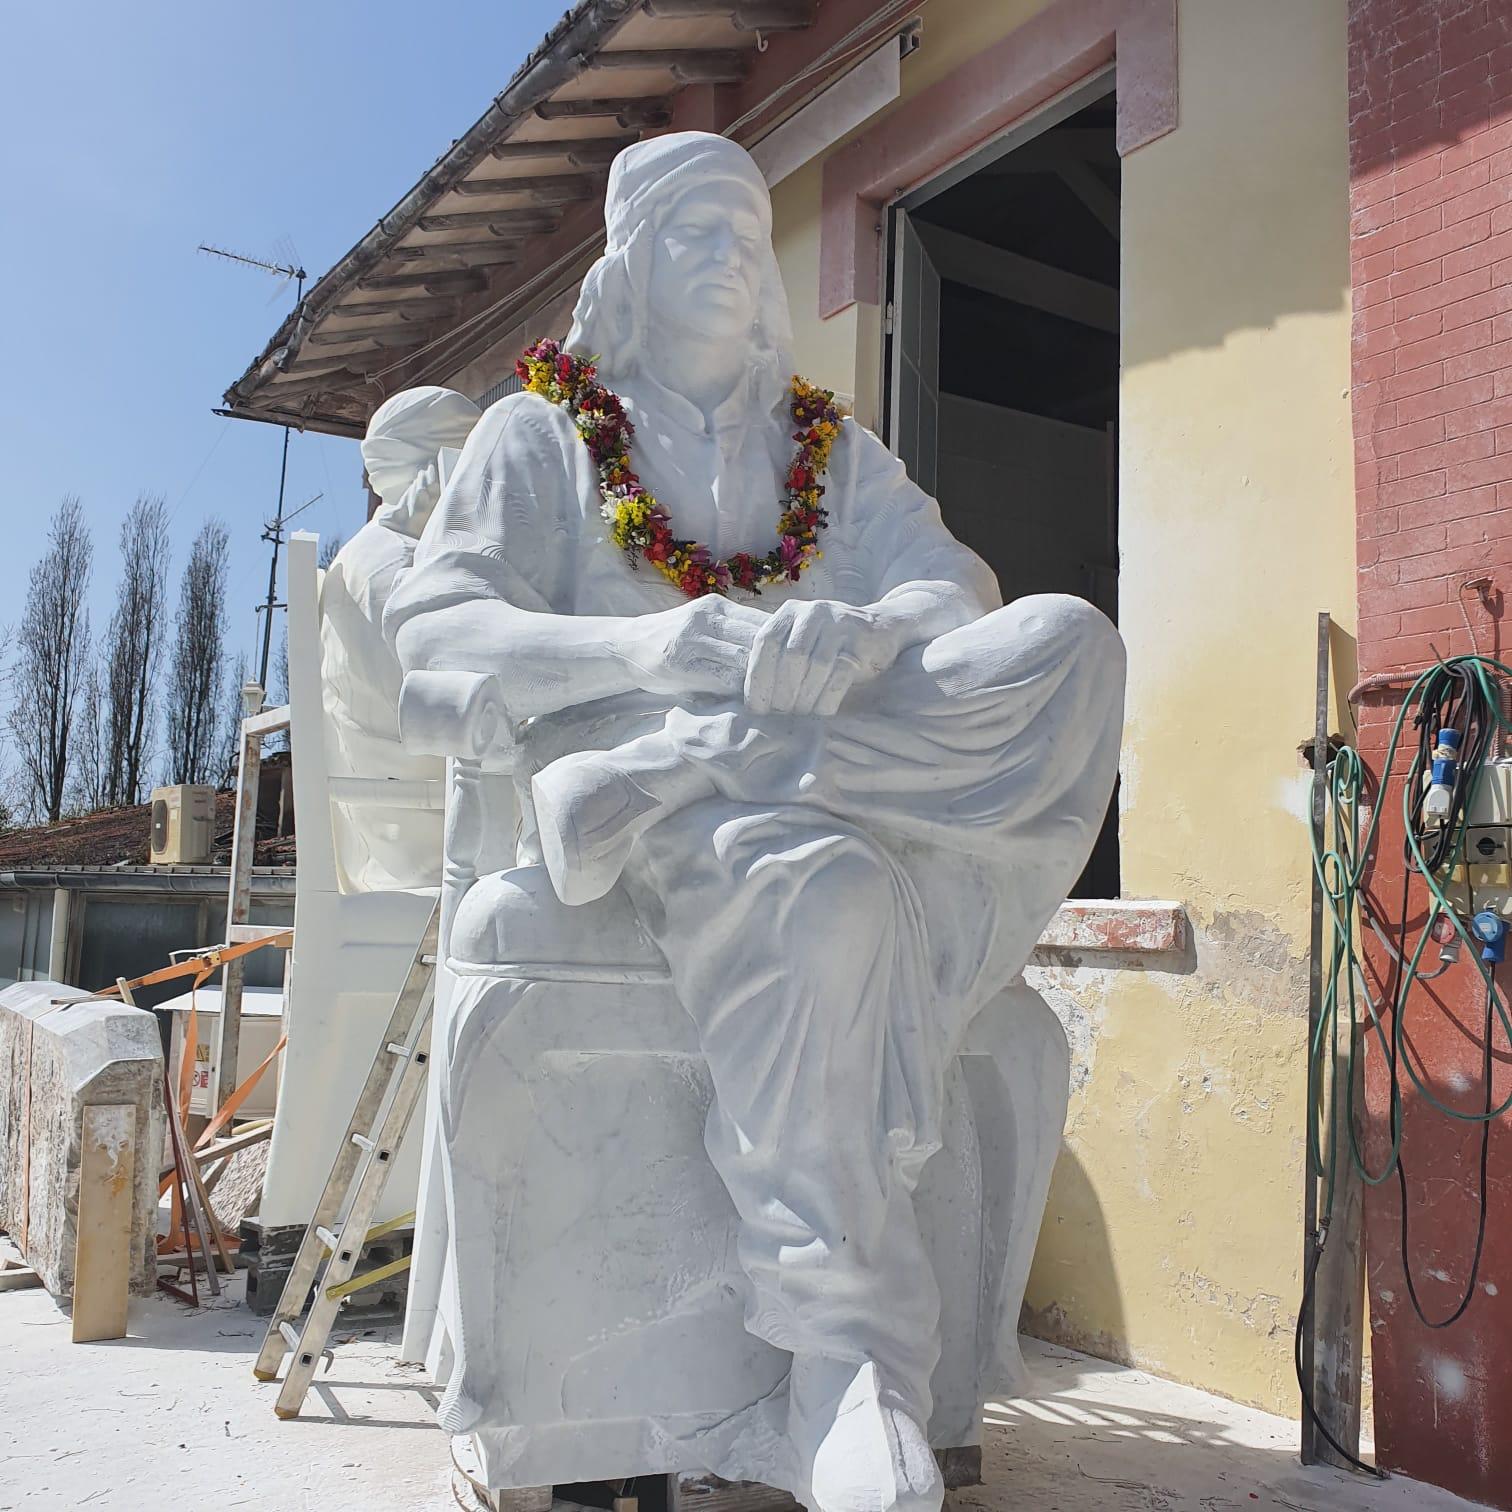 Progettata a Pietrasanta la scultura diventa star del web